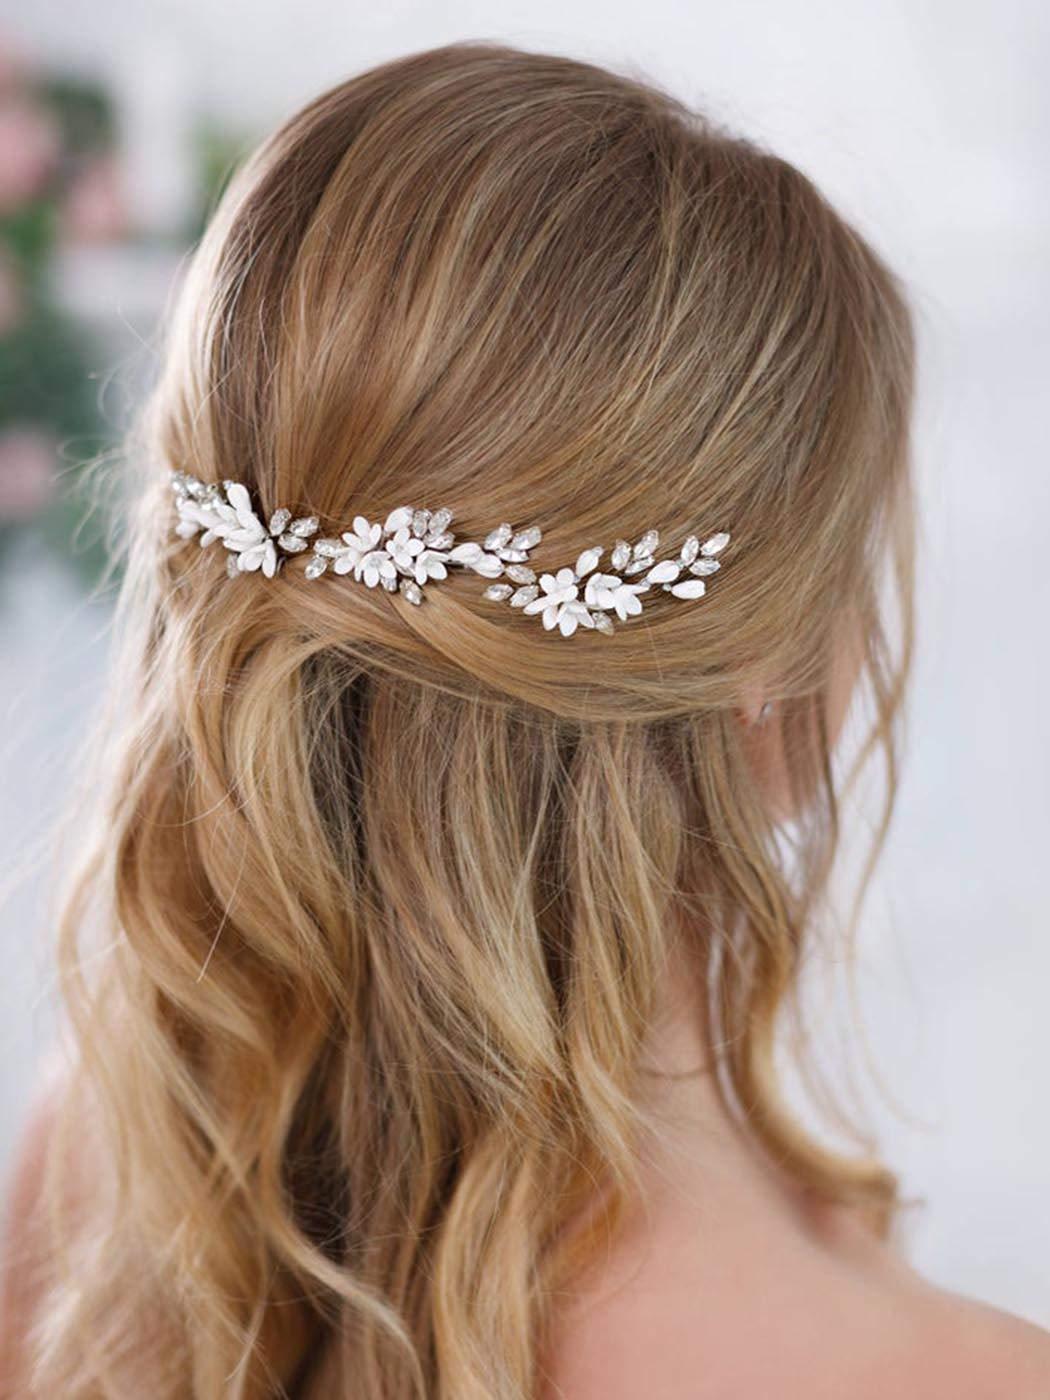 Brishow Bride Flower Wedding Hair Pins Clips Silver Rhinestones Bridal Hair Piece Crystal Hair Accessory for Women and Girls (3 PCS)